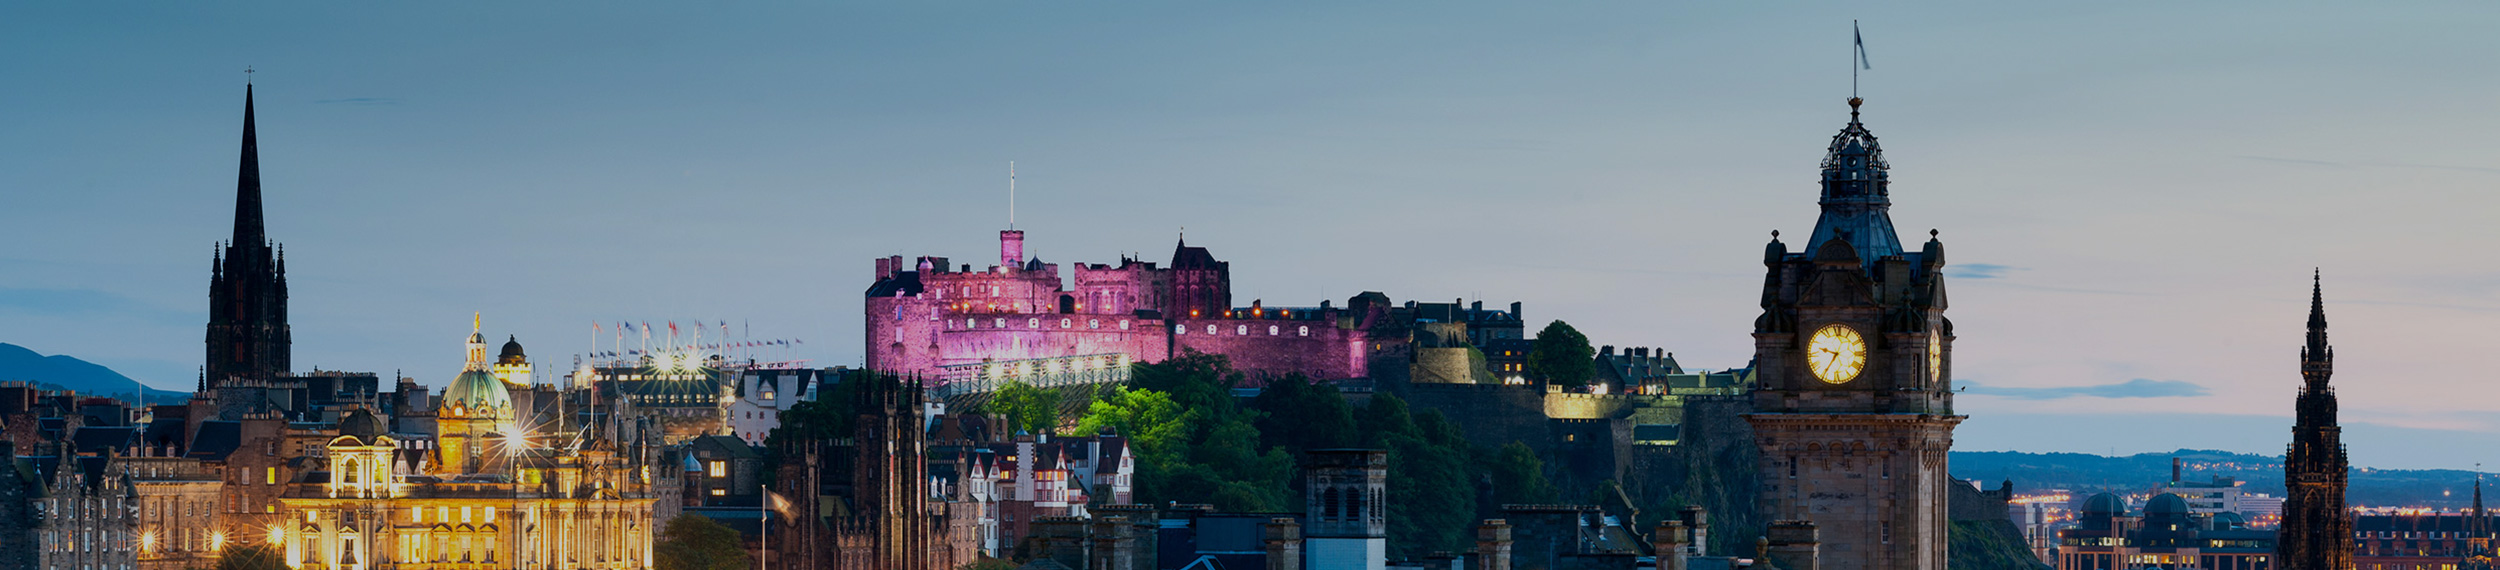 Scottish Universities Header